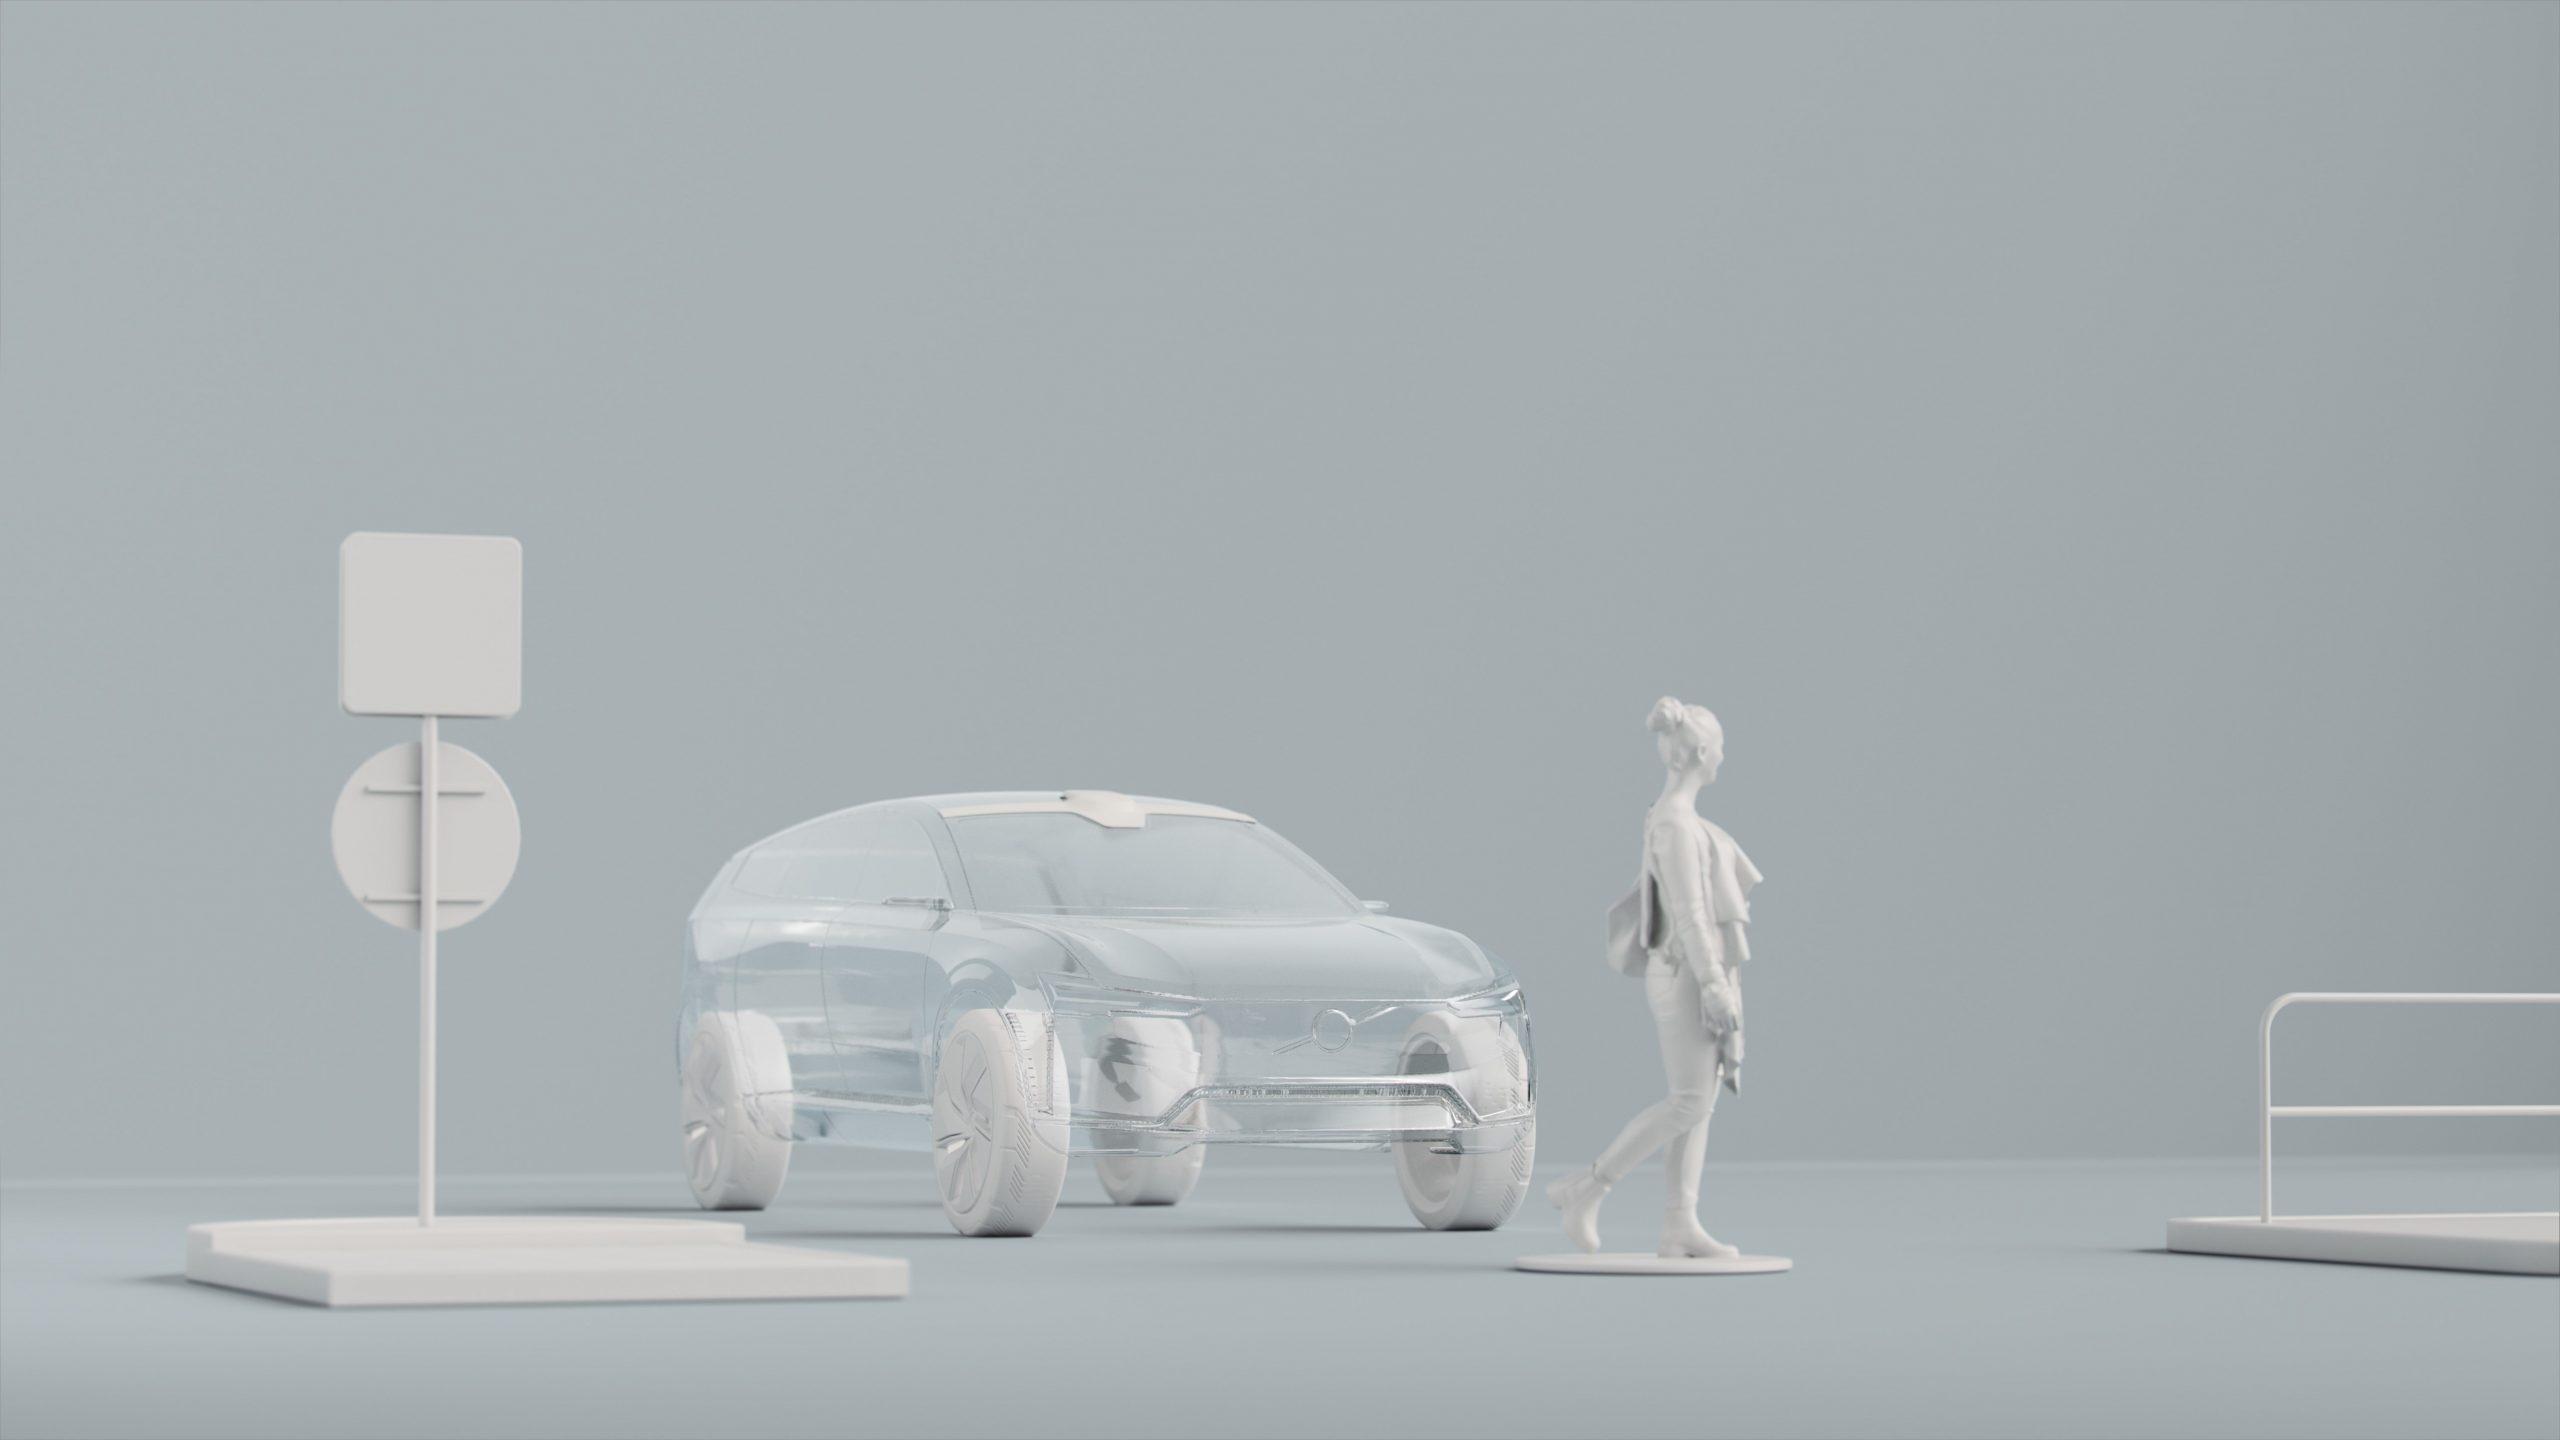 283664 Tech Moment Zero collisions scaled Πως η Volvo θα αξιοποιεί τα δεδομένα σε πραγματικό χρόνο για μεγαλύτερη ασφάλεια Volvo, Volvo Cars, ασφάλεια, ειδήσεις, Νέα